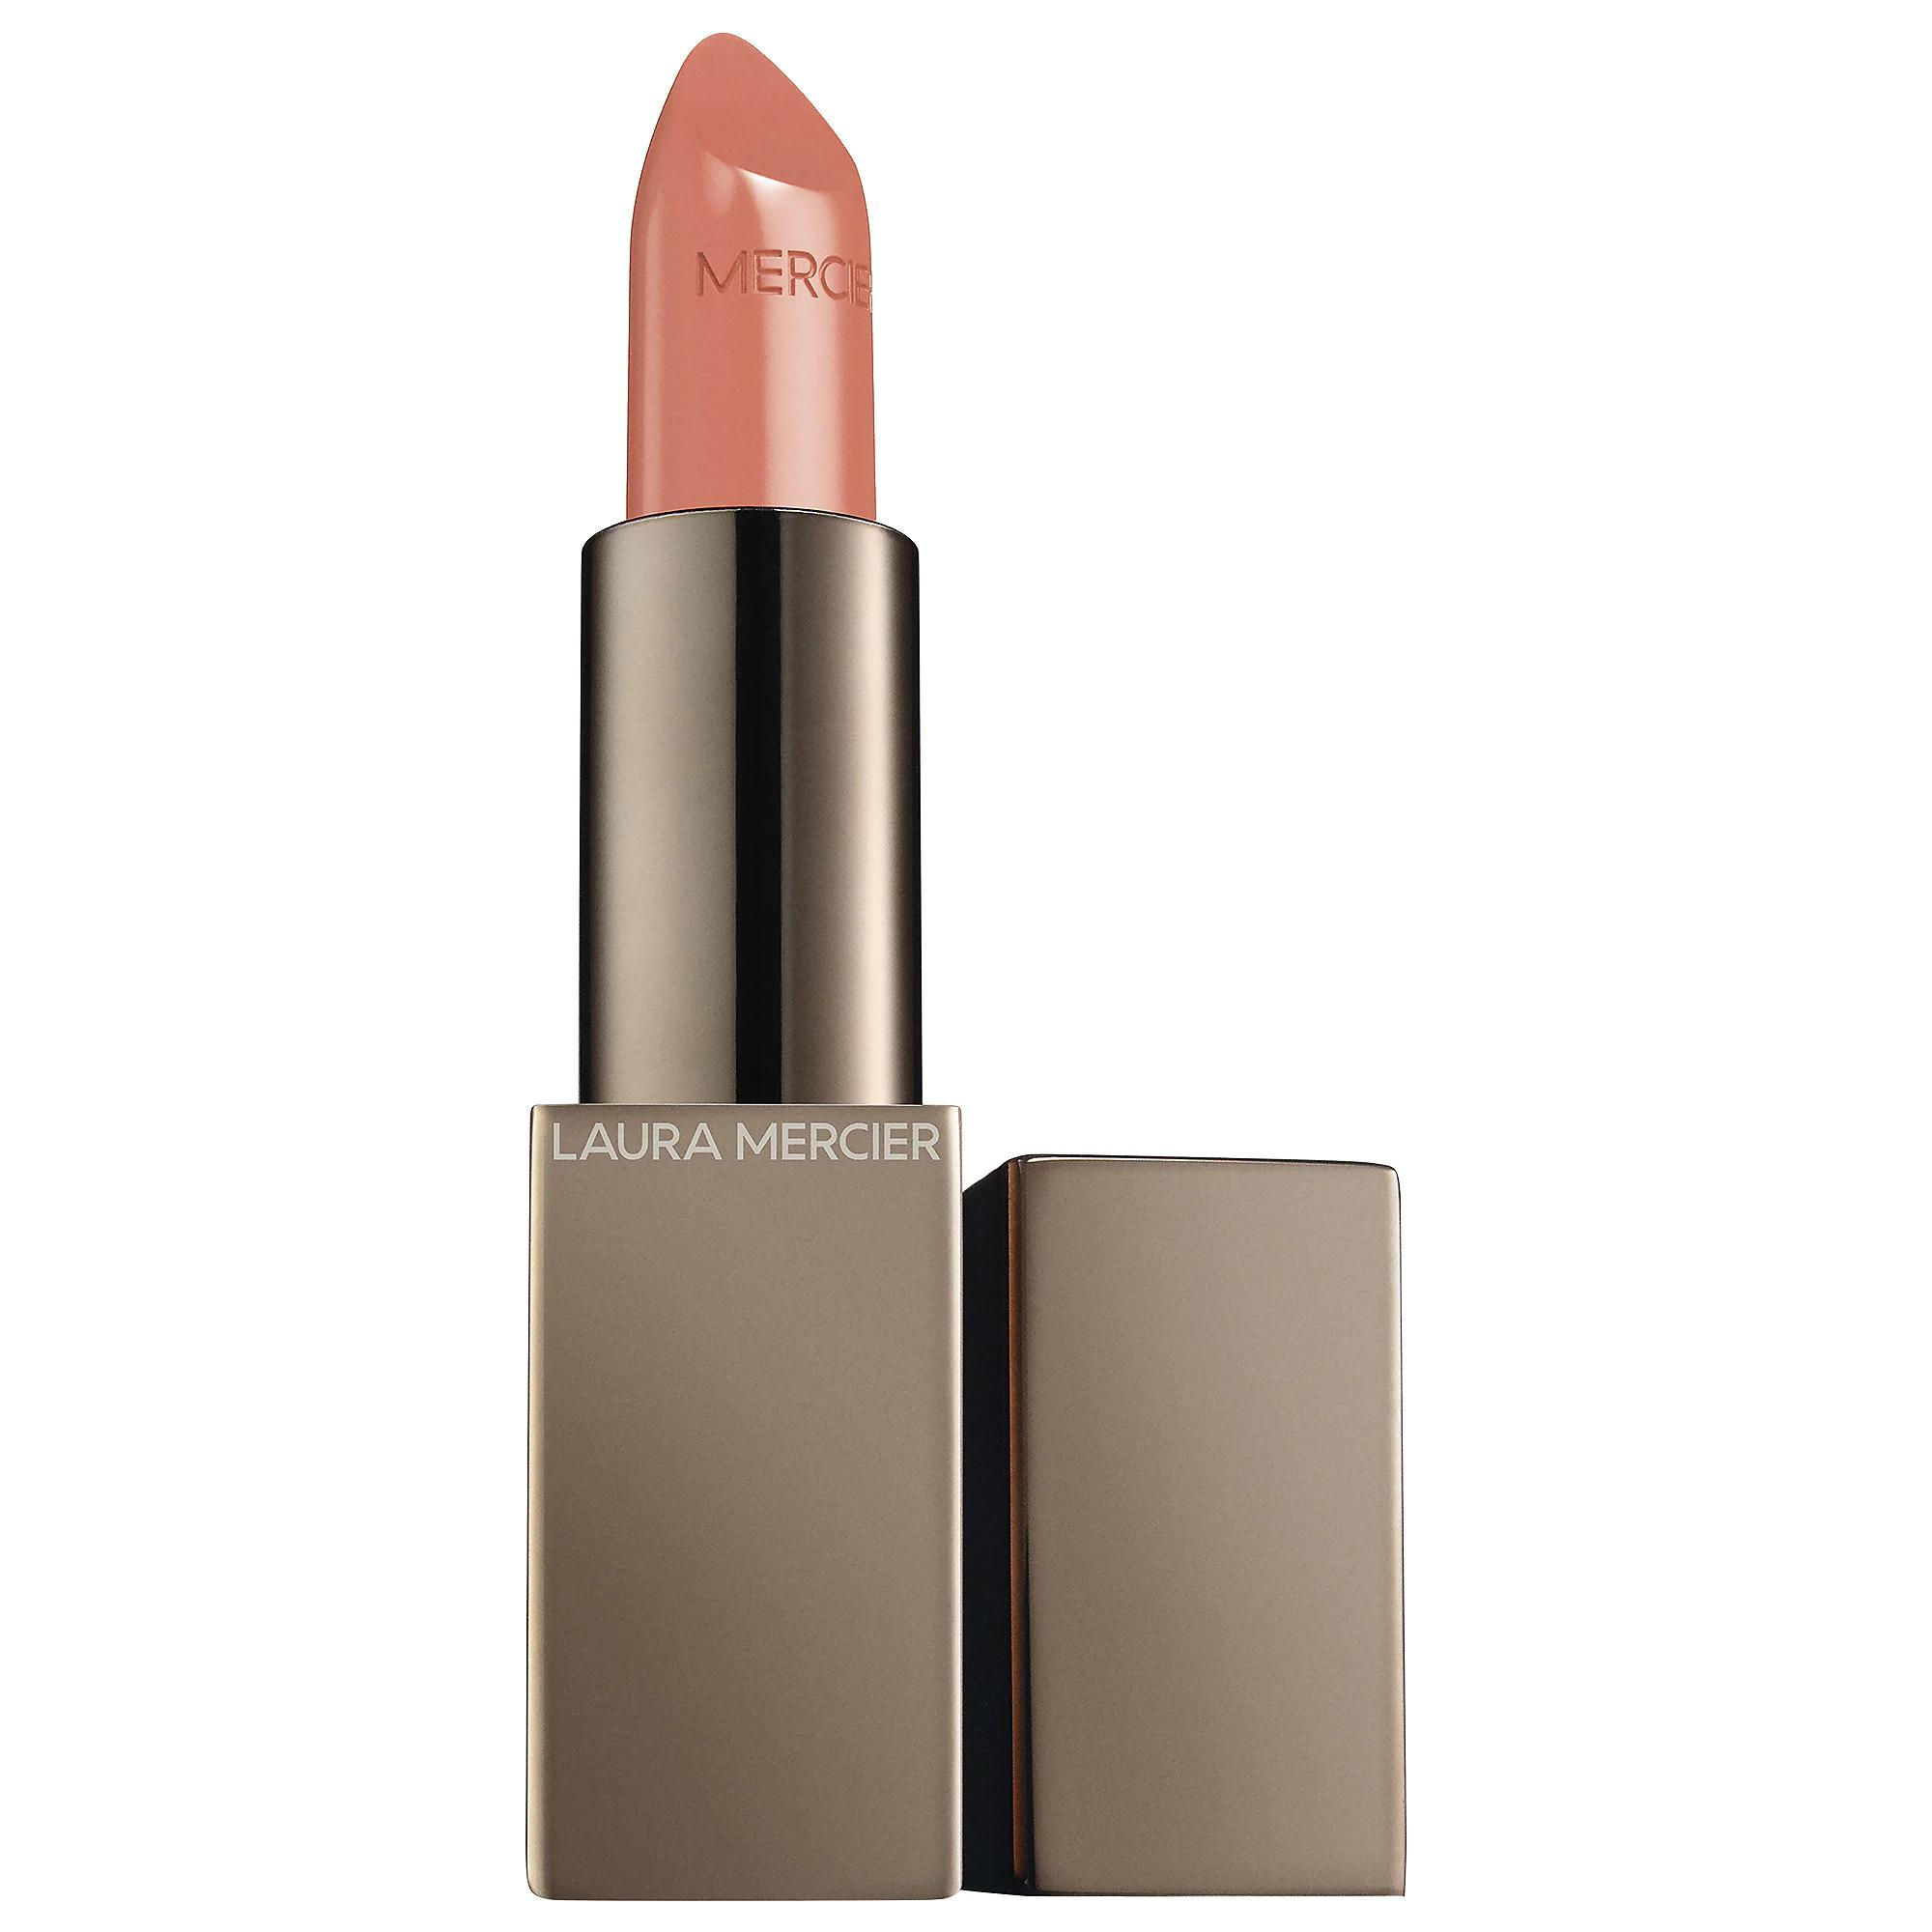 Laura Mercier Rouge Essentiel Silky Creme Lipstick Nude Nouveau